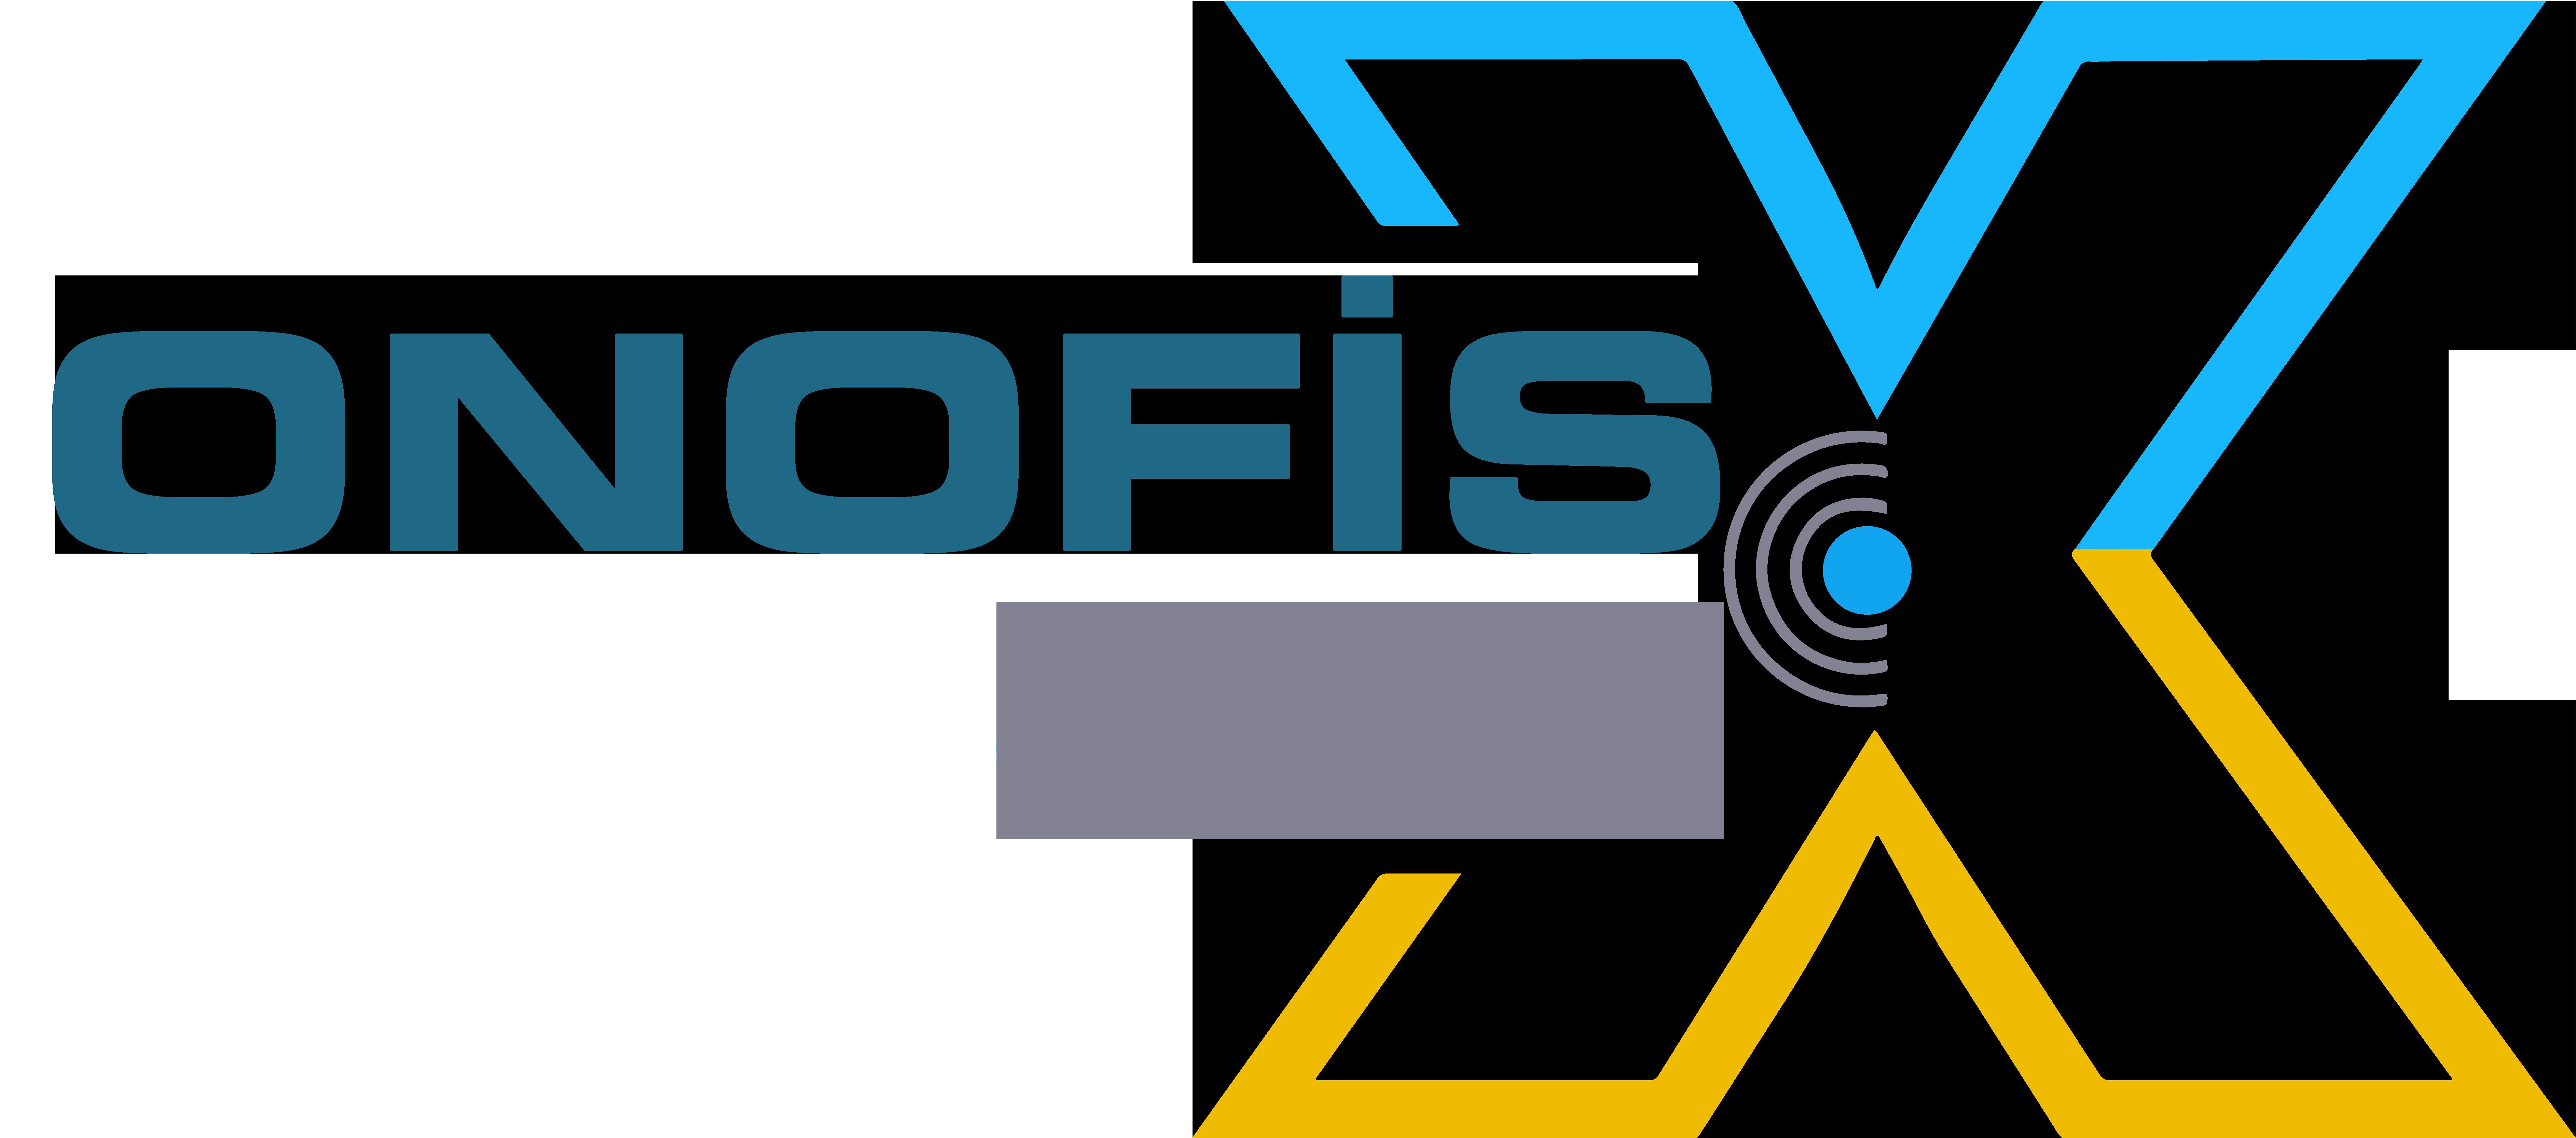 ONOFIS Internet Hizmetleri Kimya San. Tic. Ltd. Sti.